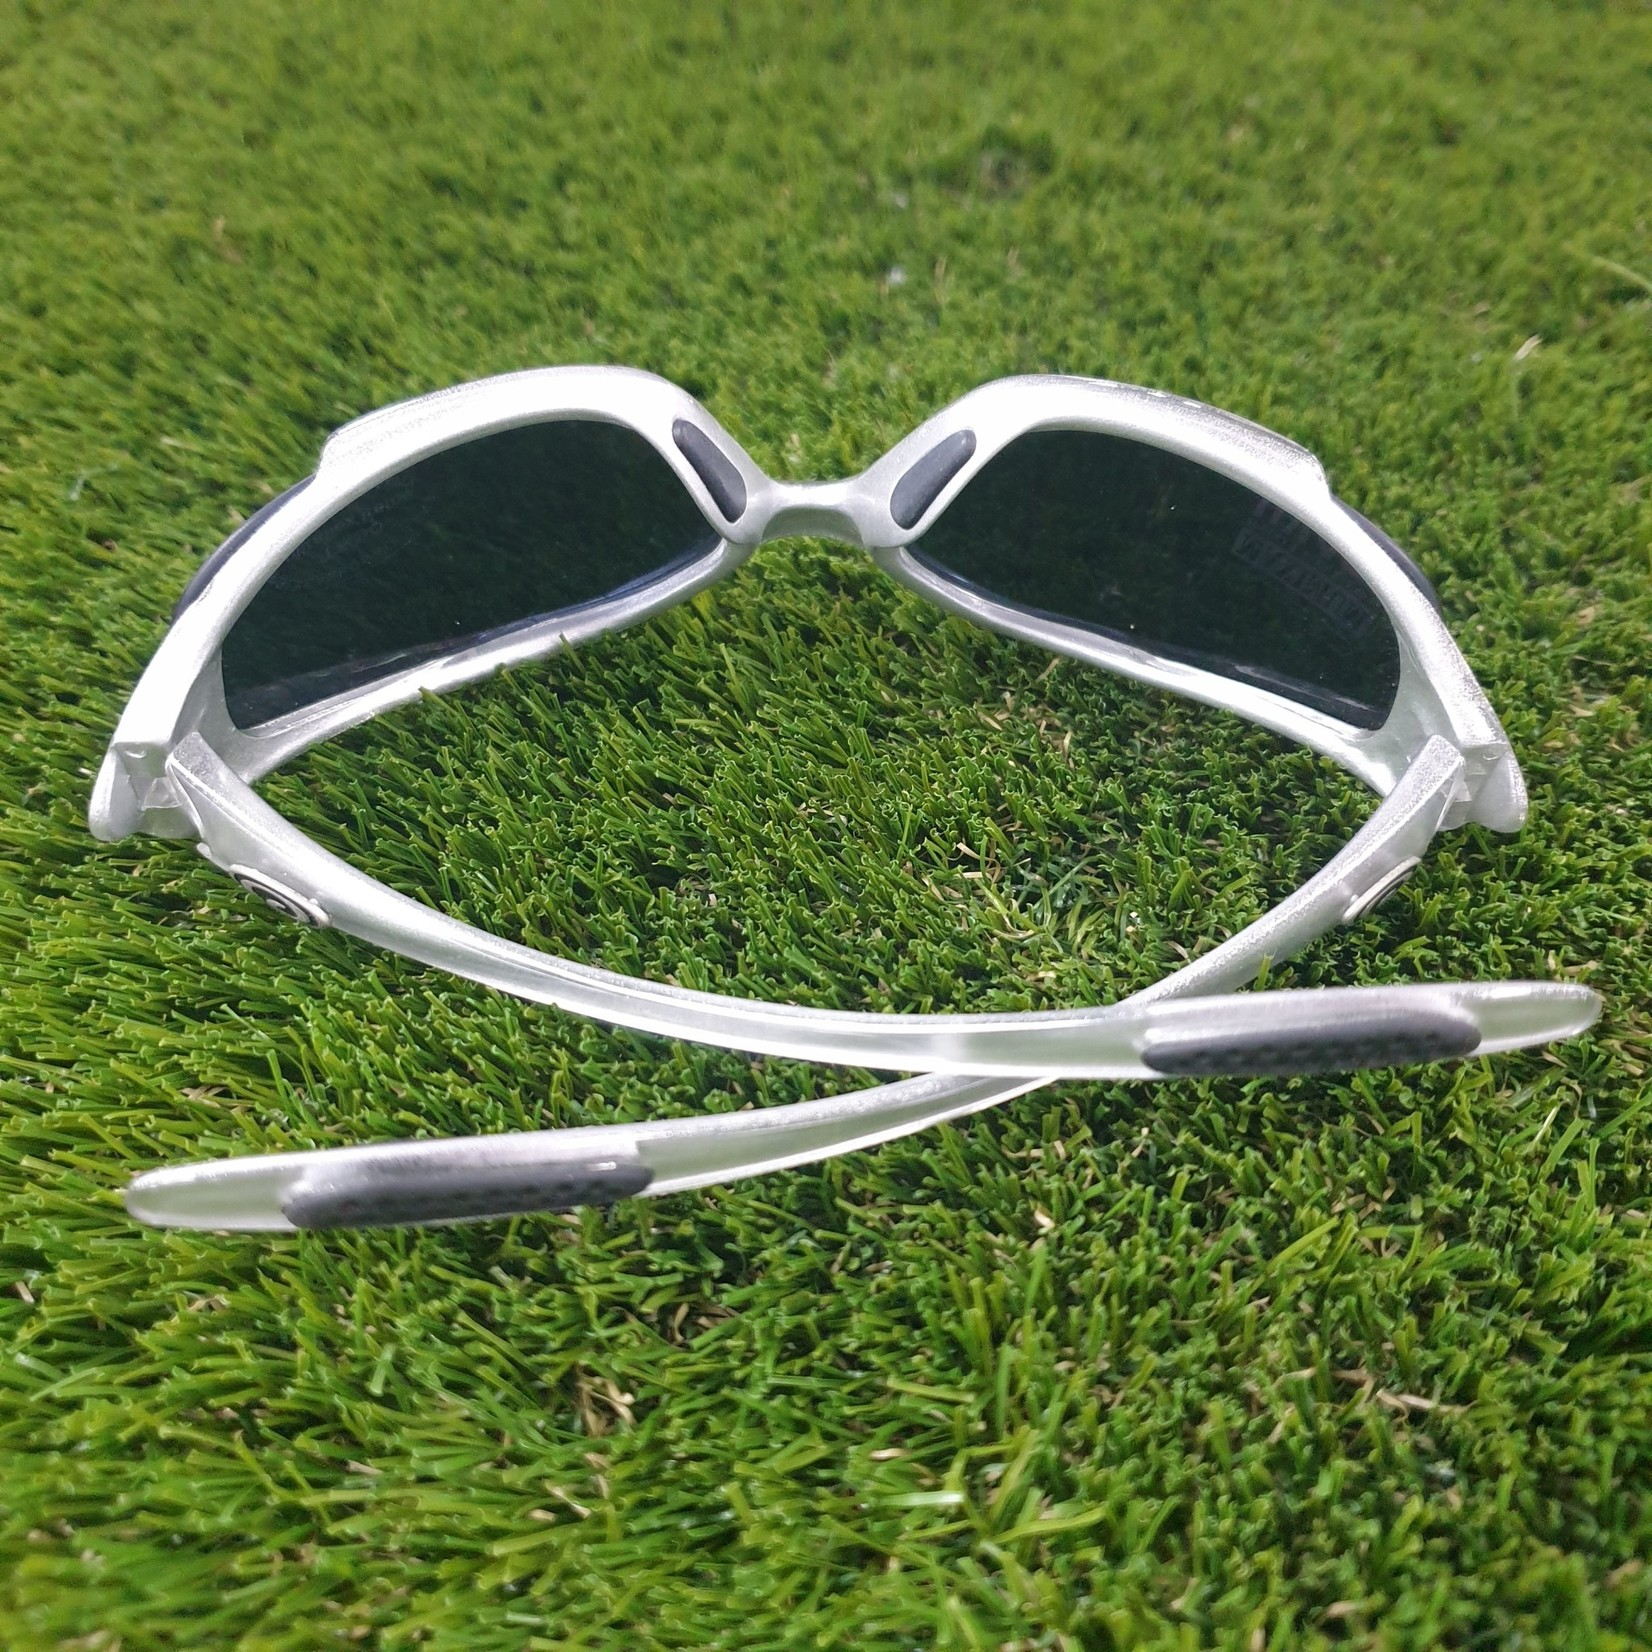 Ocean Sunglasses 36-17 UV 400 Silver